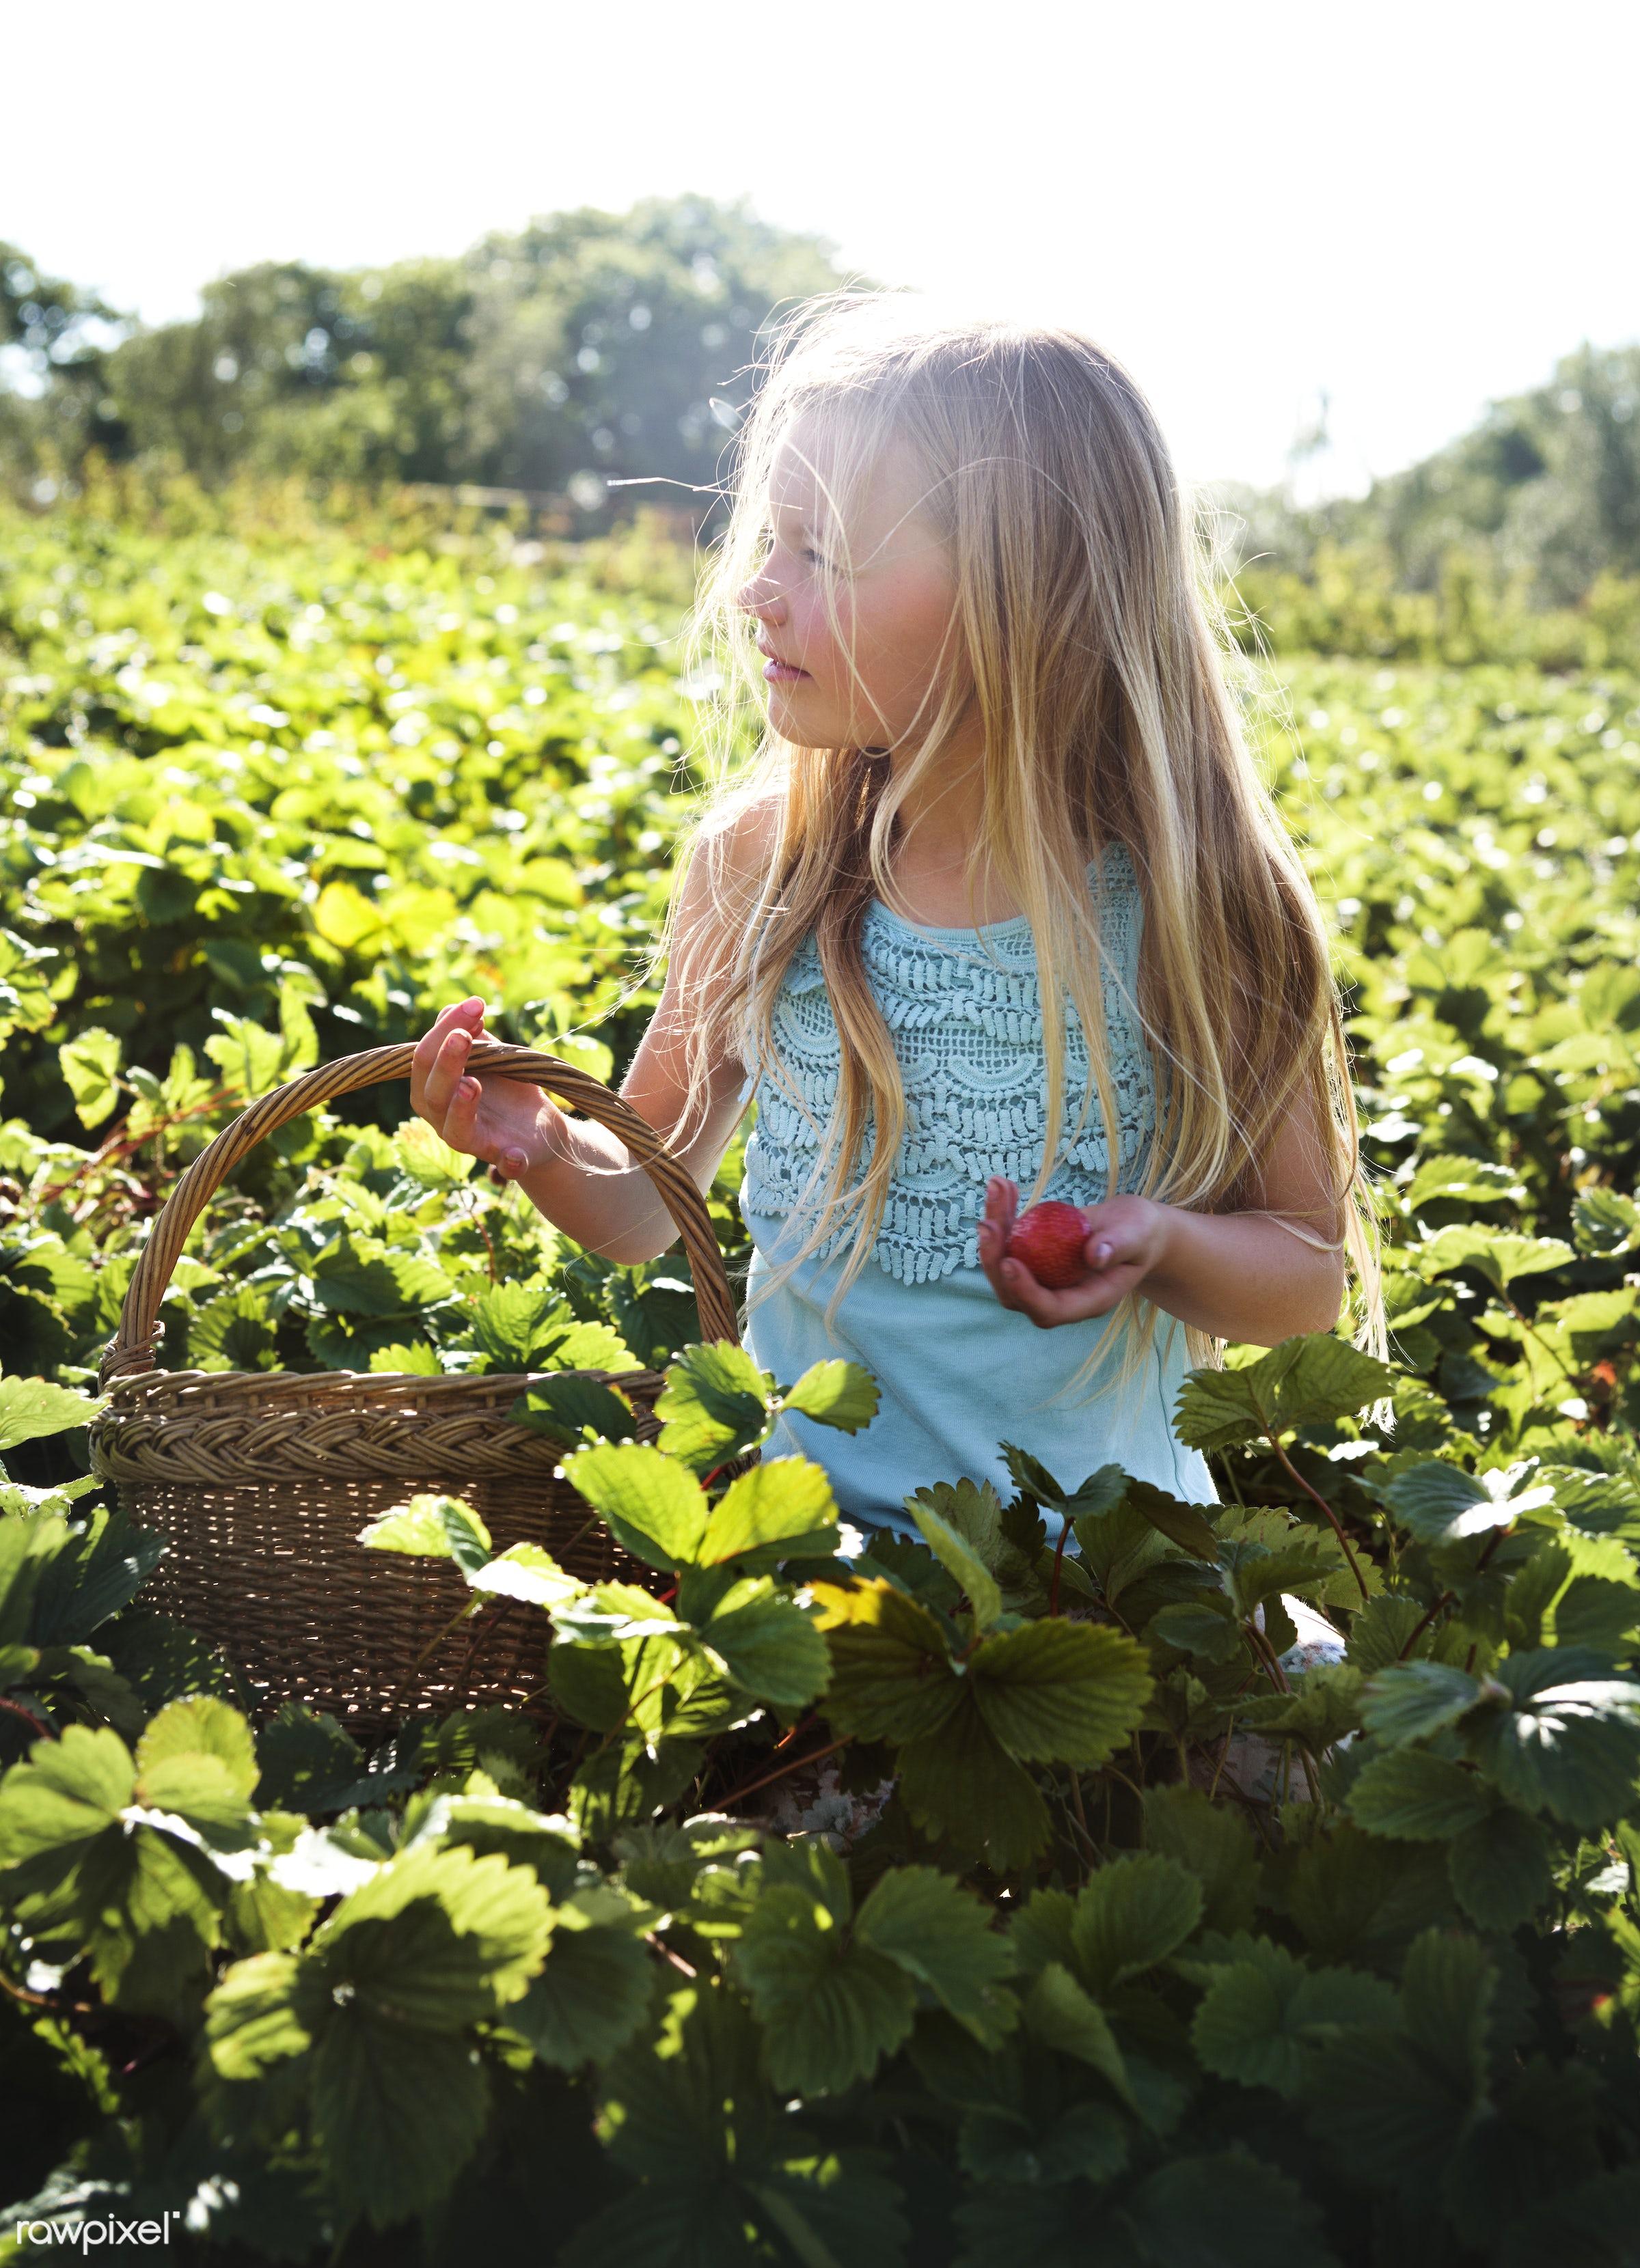 Kid in strawberry farm - alone, backyard, botany, caucasian, countryside, cultivate, field, fresh, fruit, garden, gardener,...